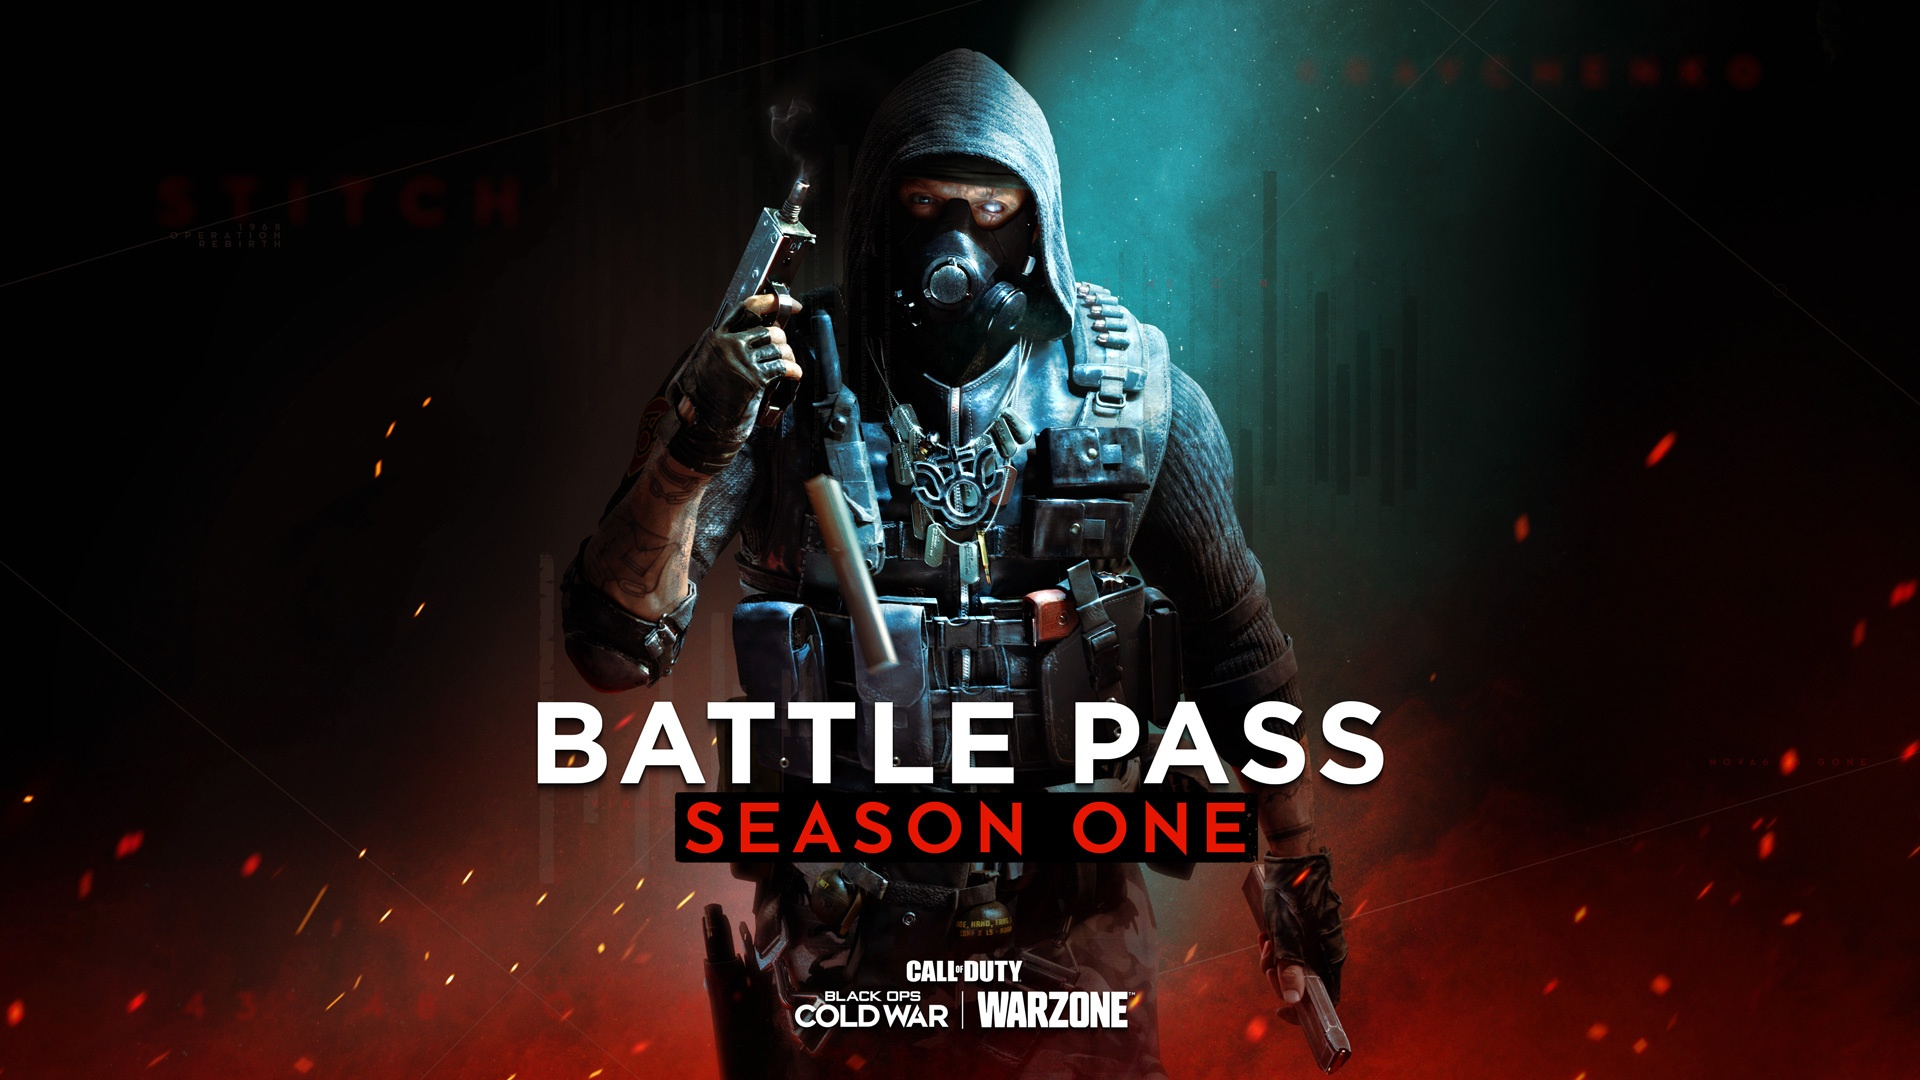 Bedava Warzone Battle Pass